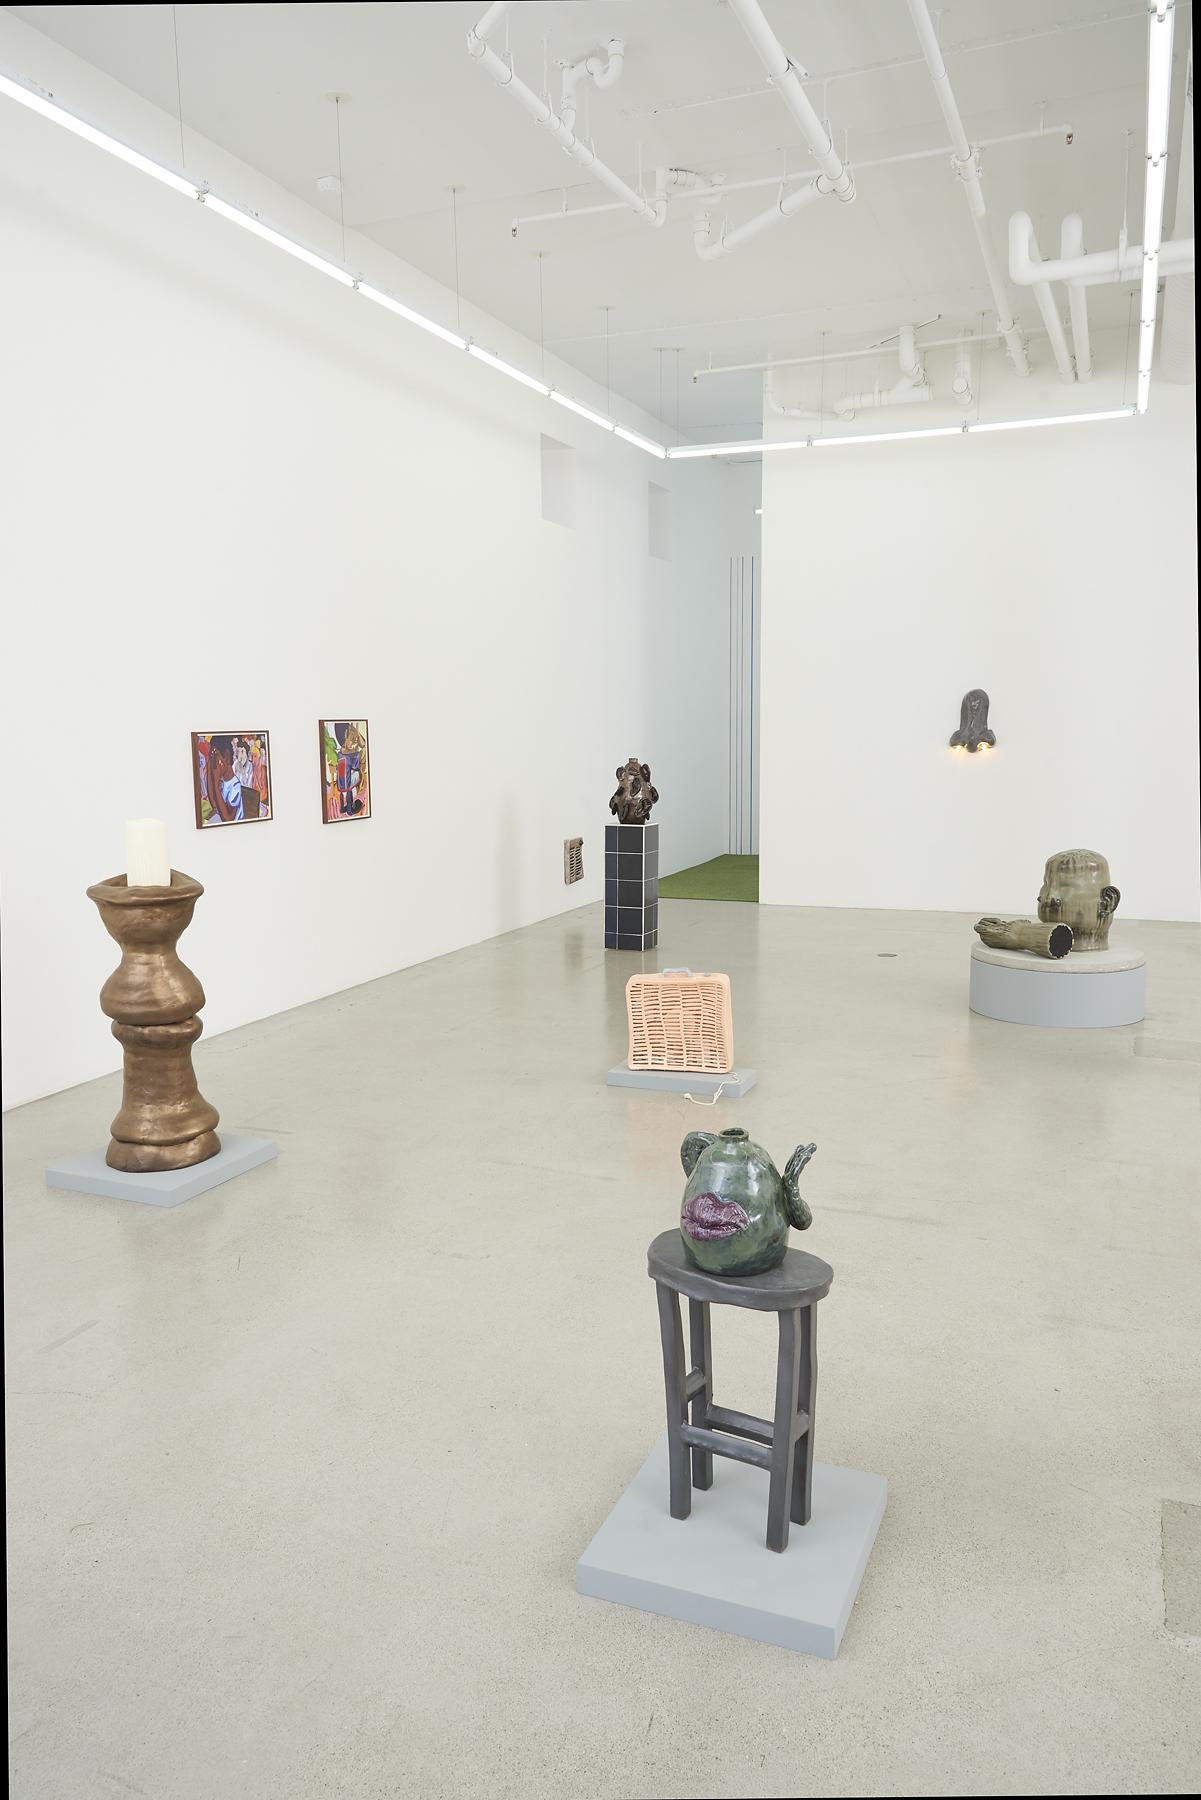 Othello_Living Room, 2018_Jessica Silverman Gallery_Installation view 12.PRS.jpg